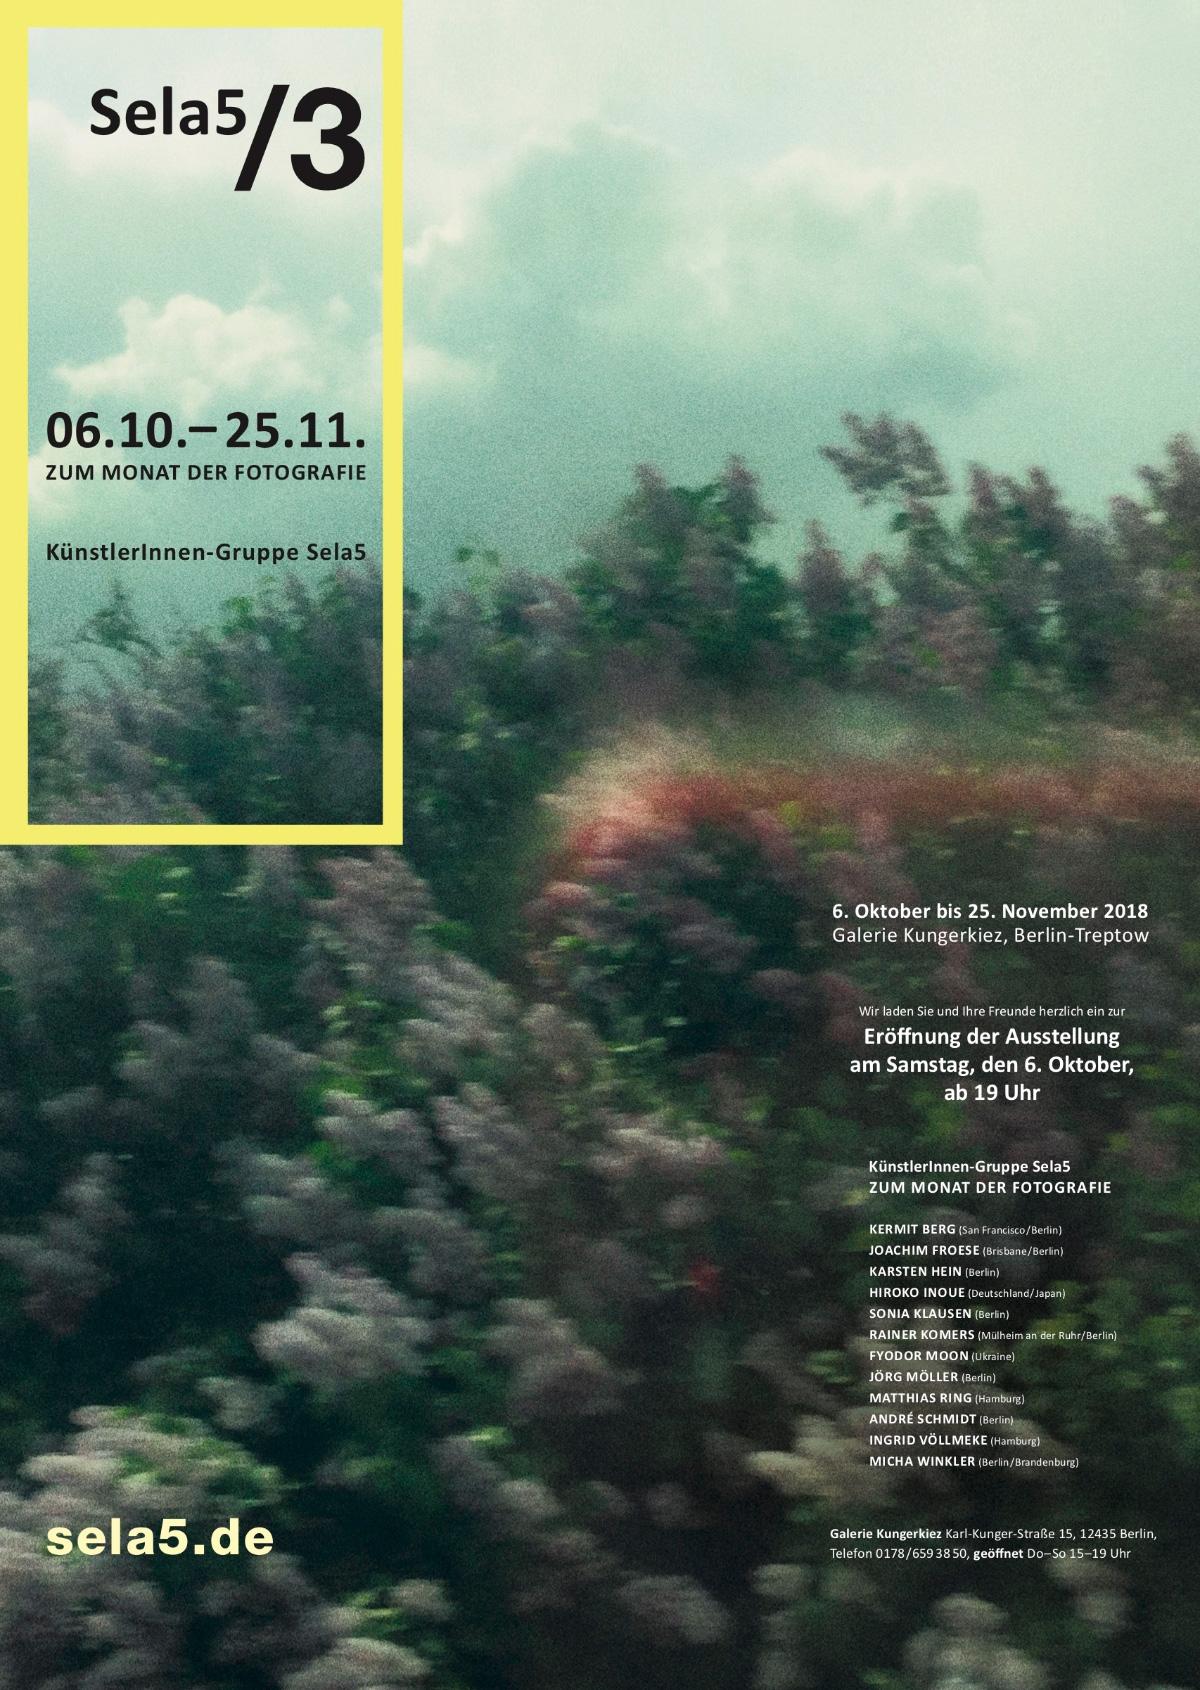 Sela5/3 – Zum Monat der Fotografie in Berlin